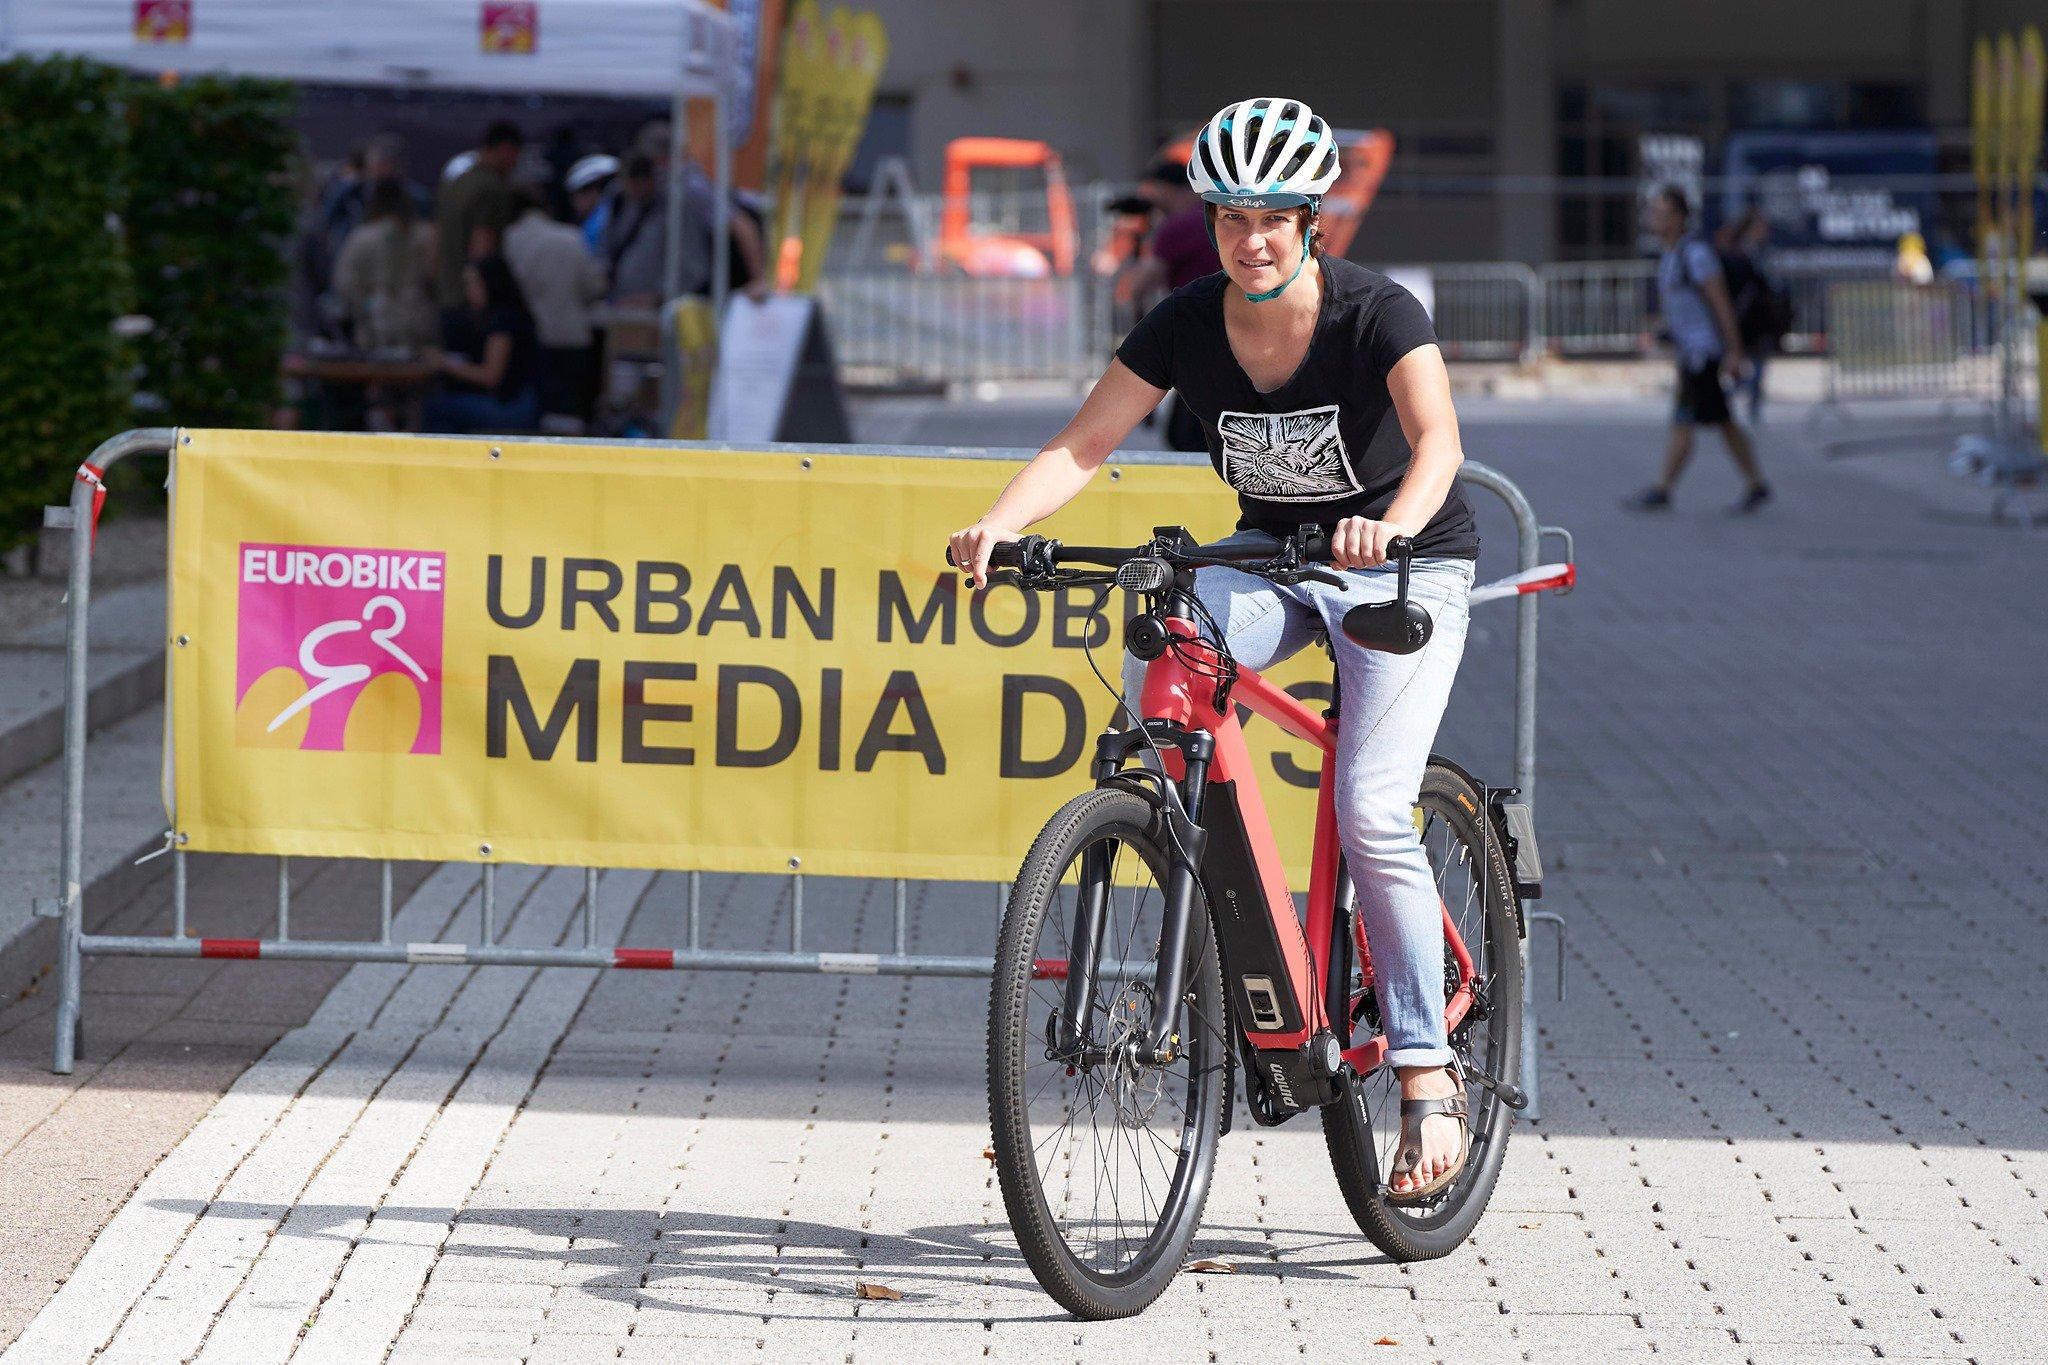 eurobike-media-days